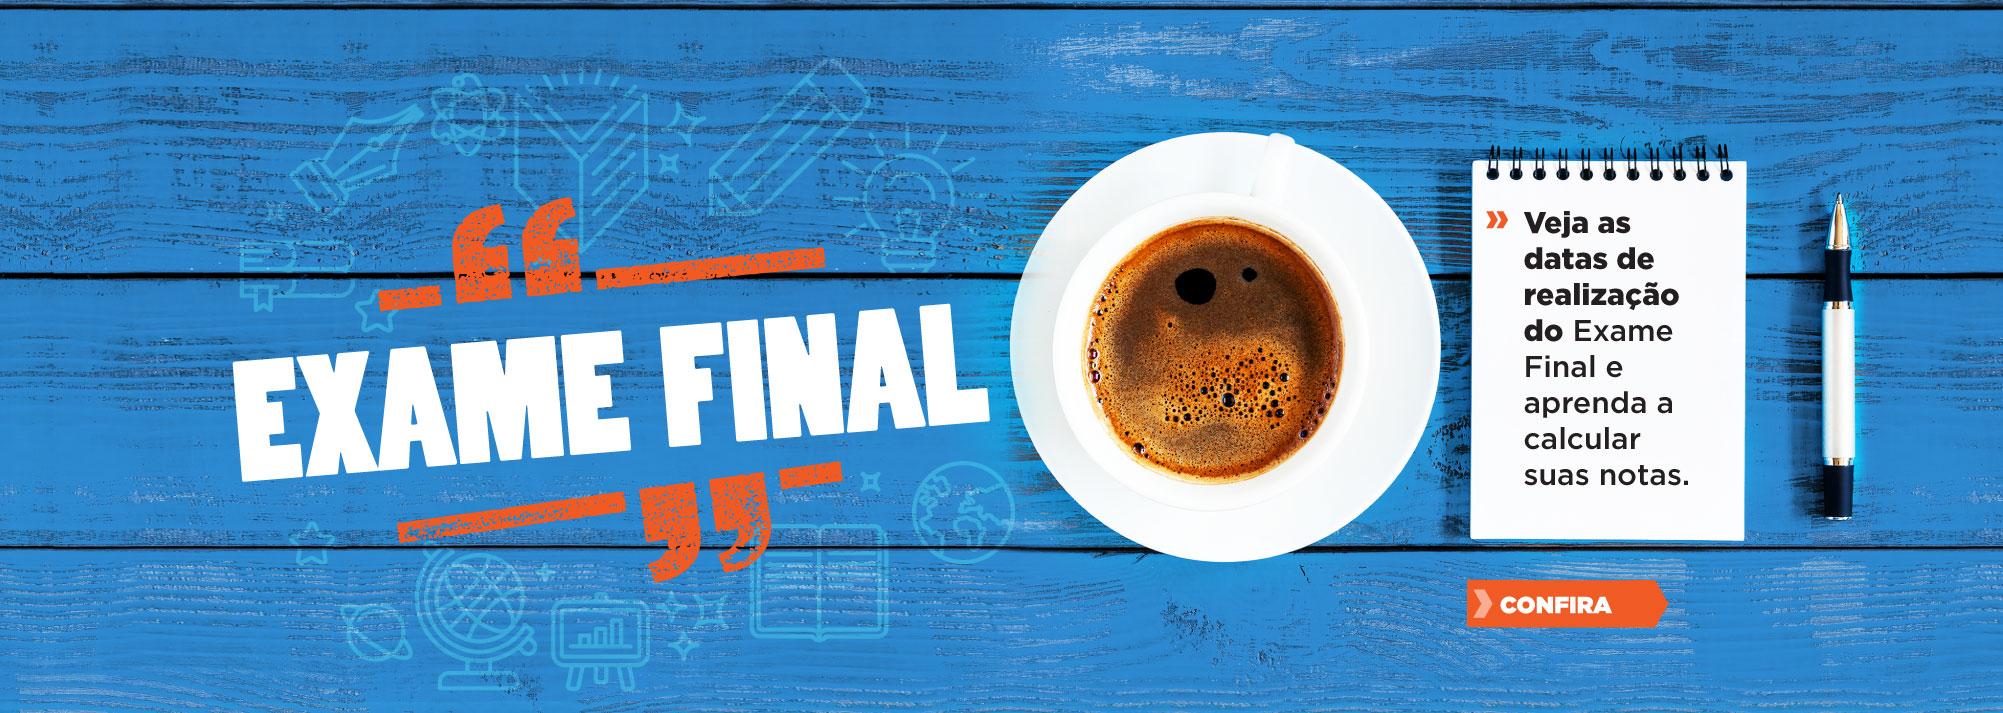 exame_final